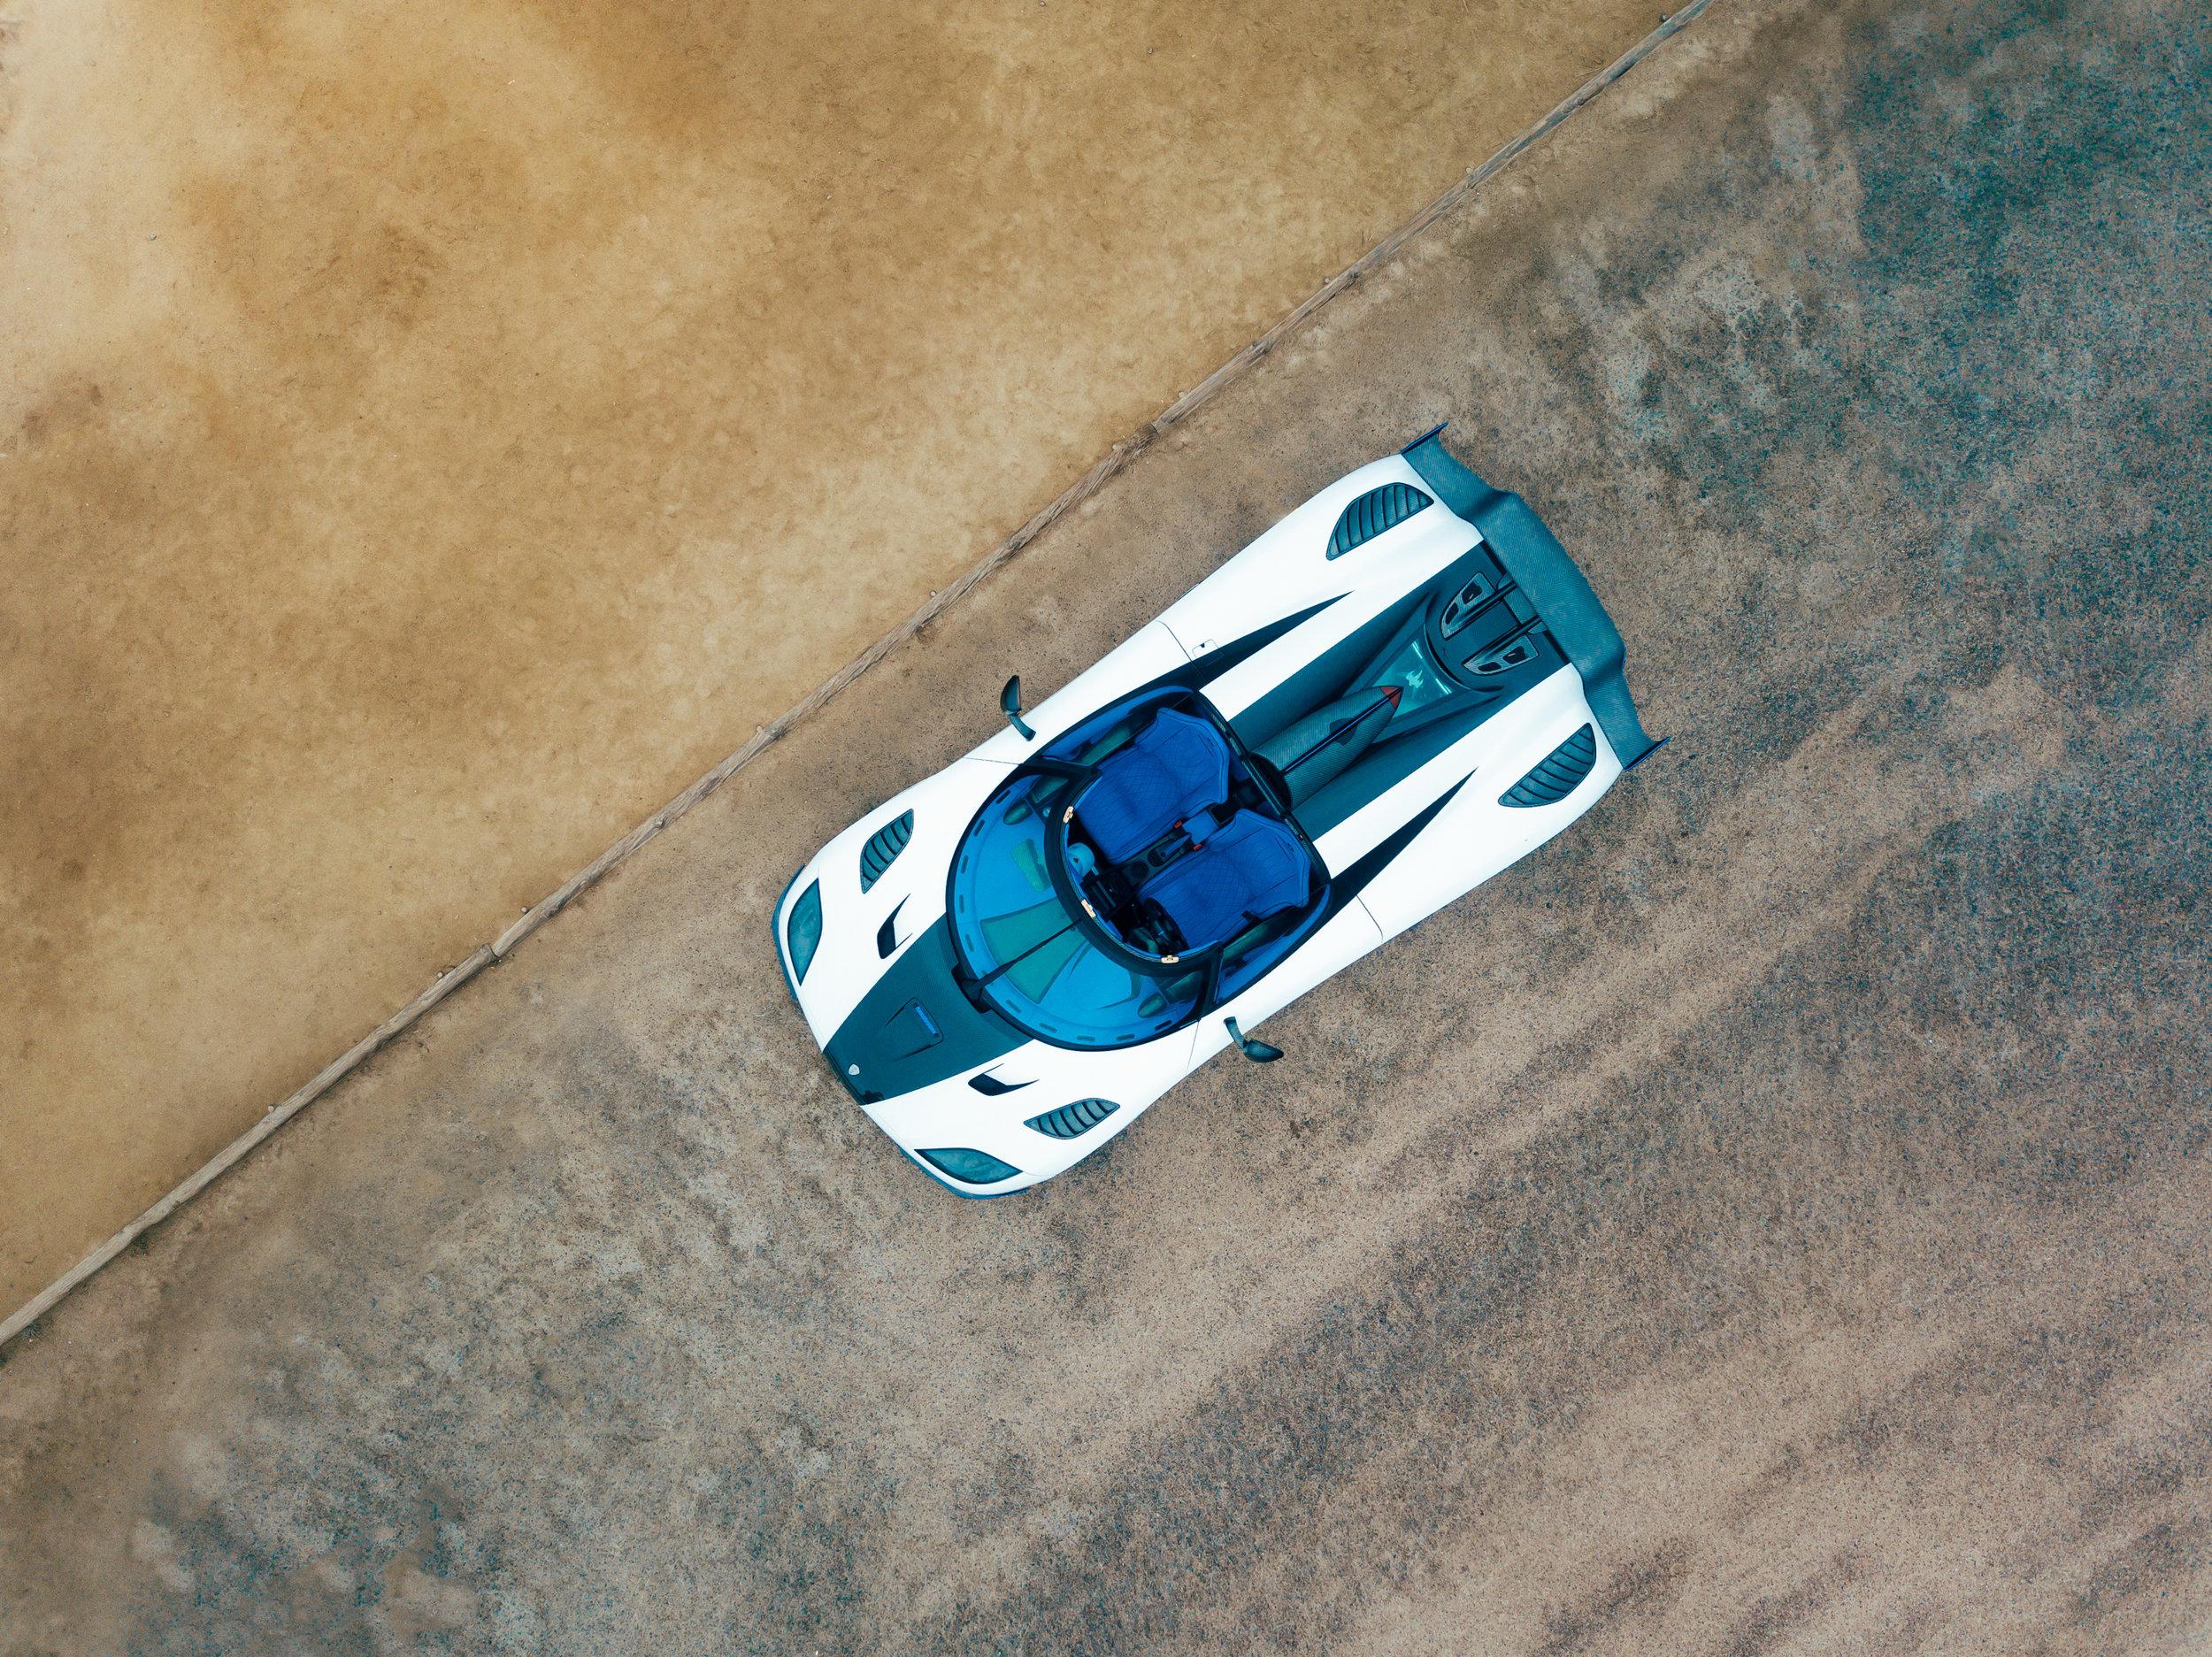 Stay_Driven_Monterey_Car_Week_Whitesse_Koenigsegg-1.jpg